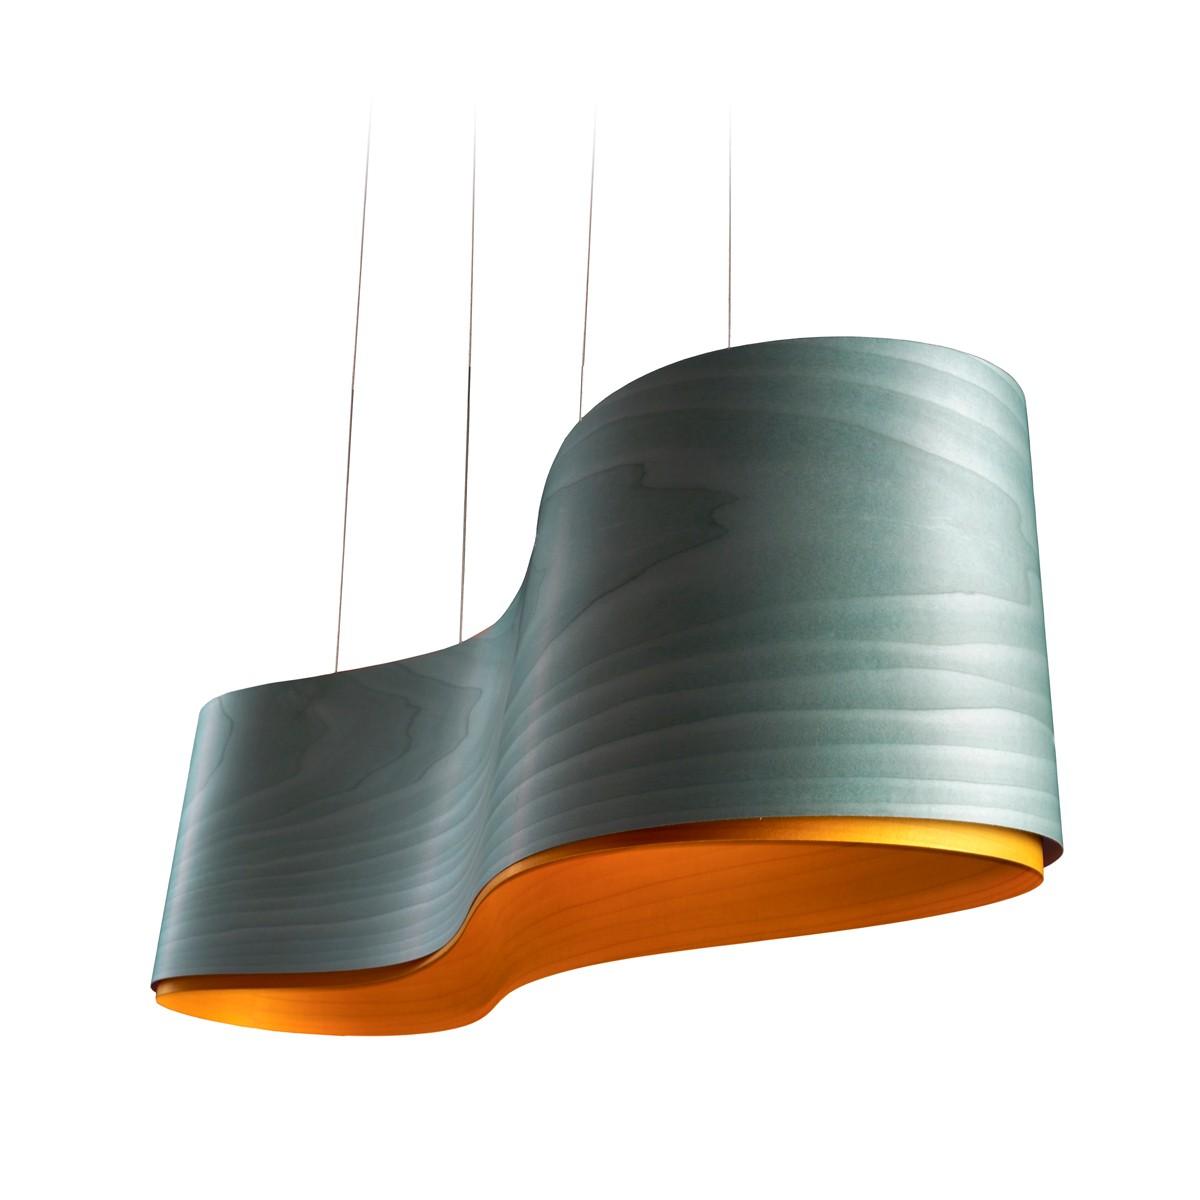 LZF Lamps New Wave Pendelleuchte, türkis, innen: gelb